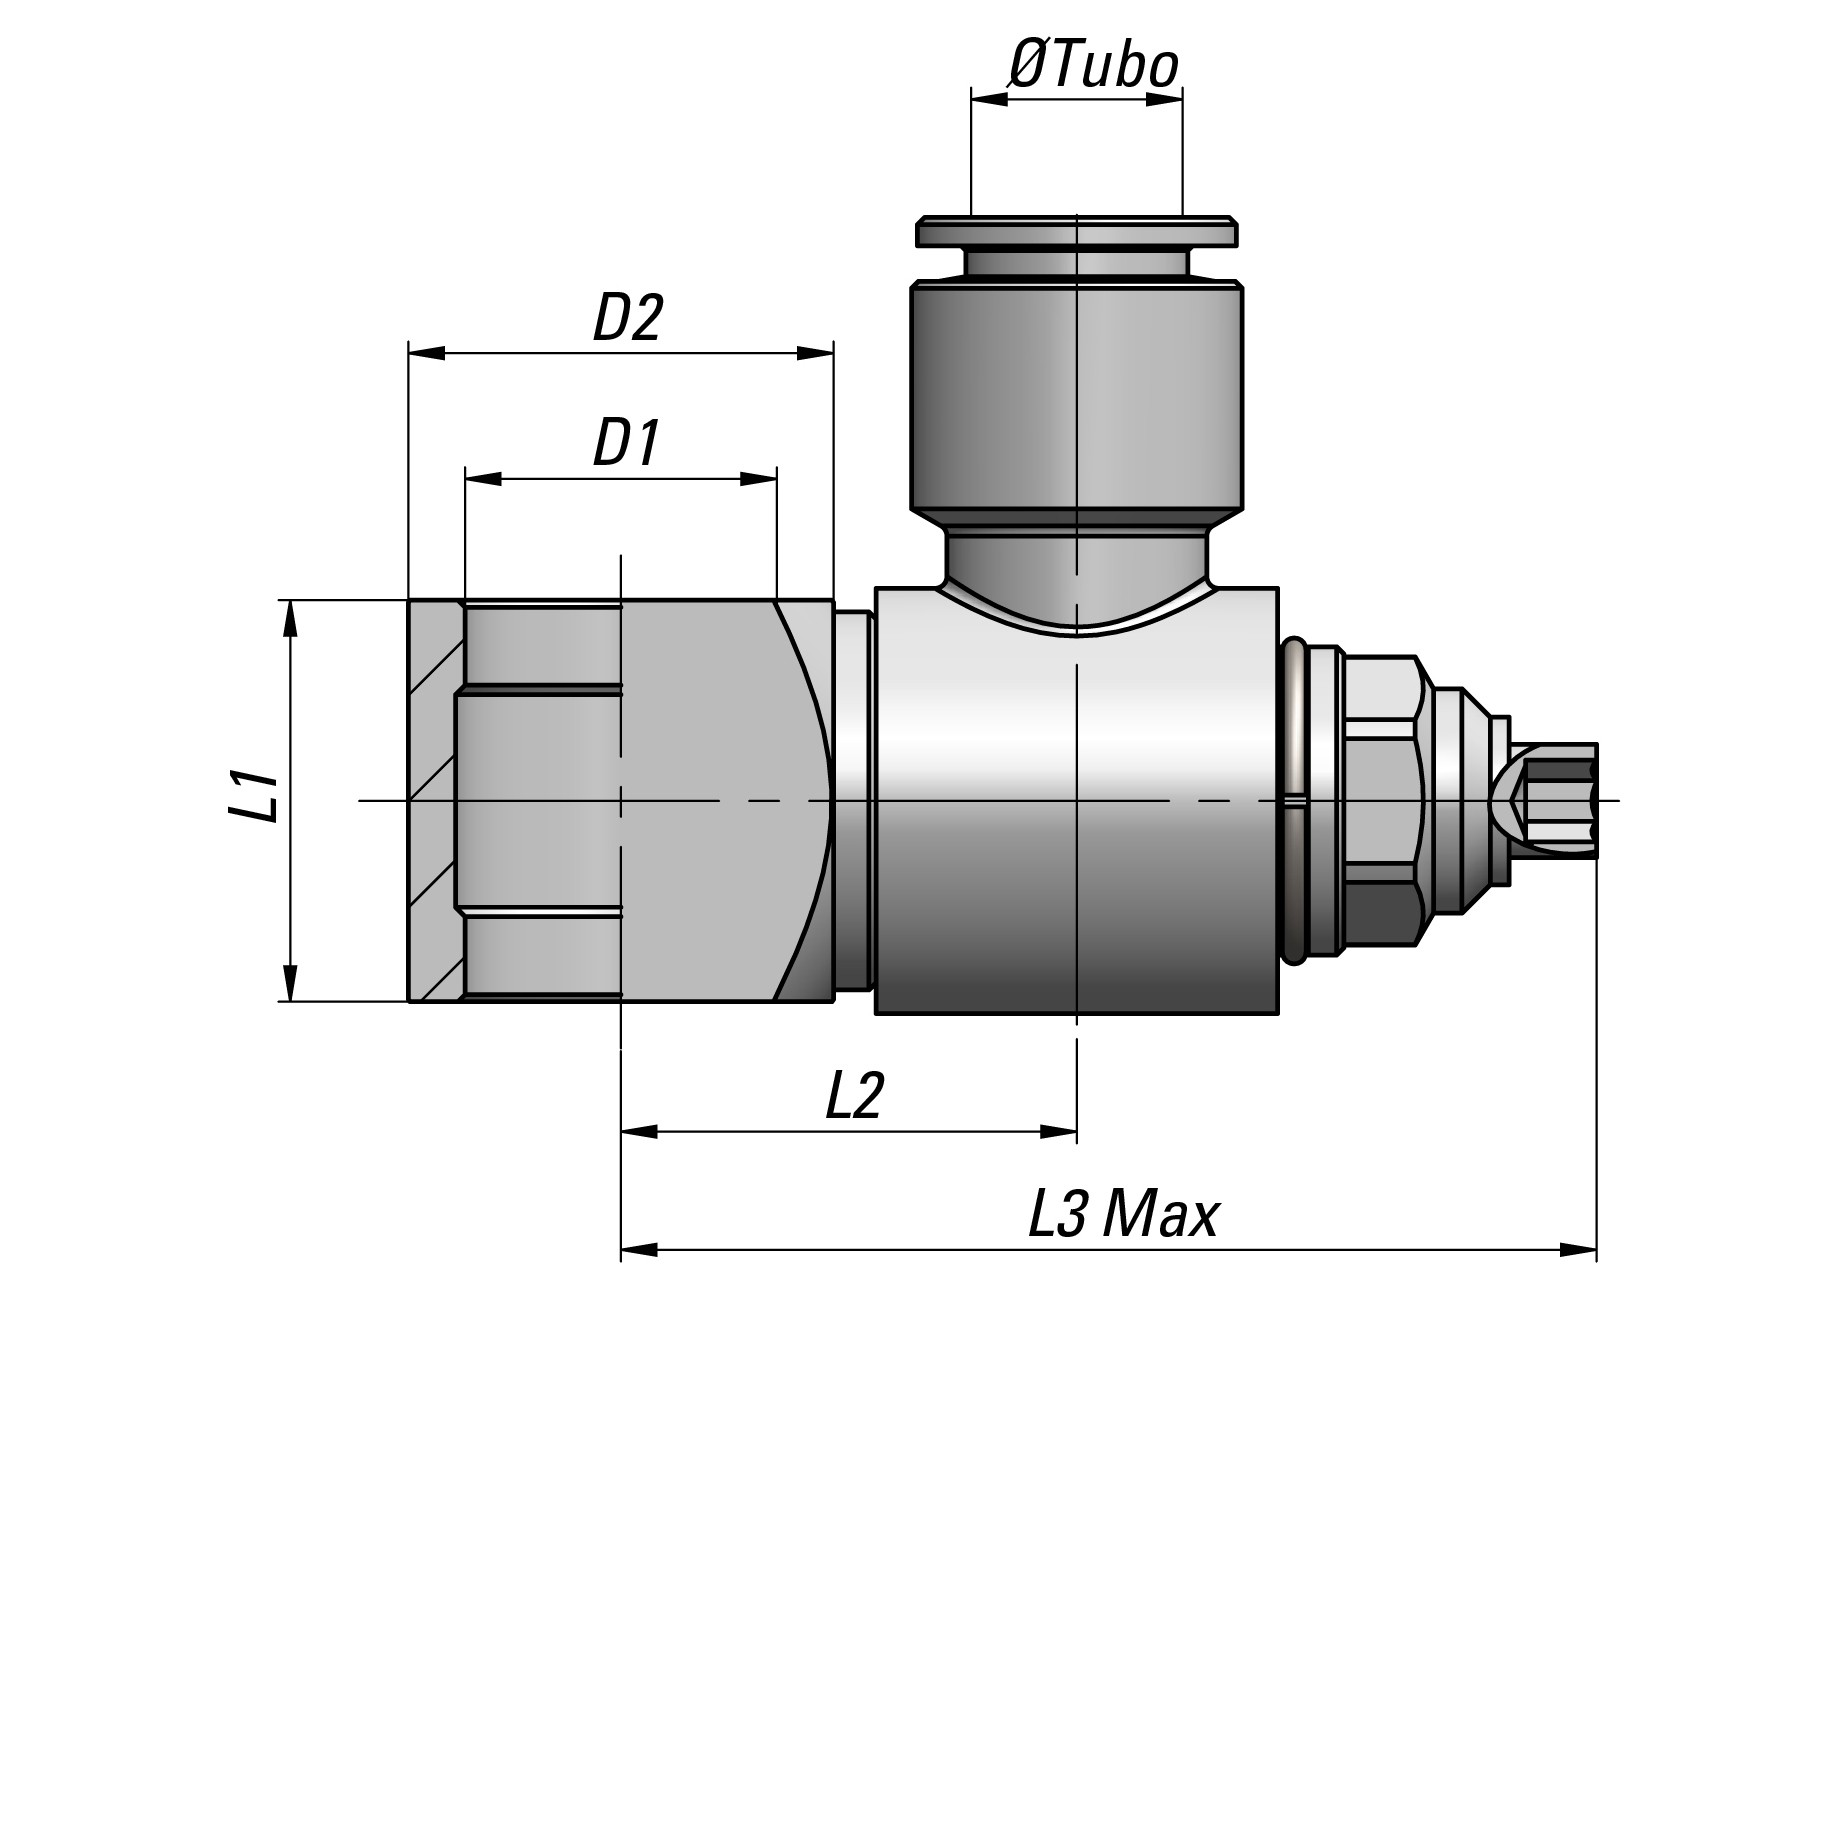 MV49 10 38 /C